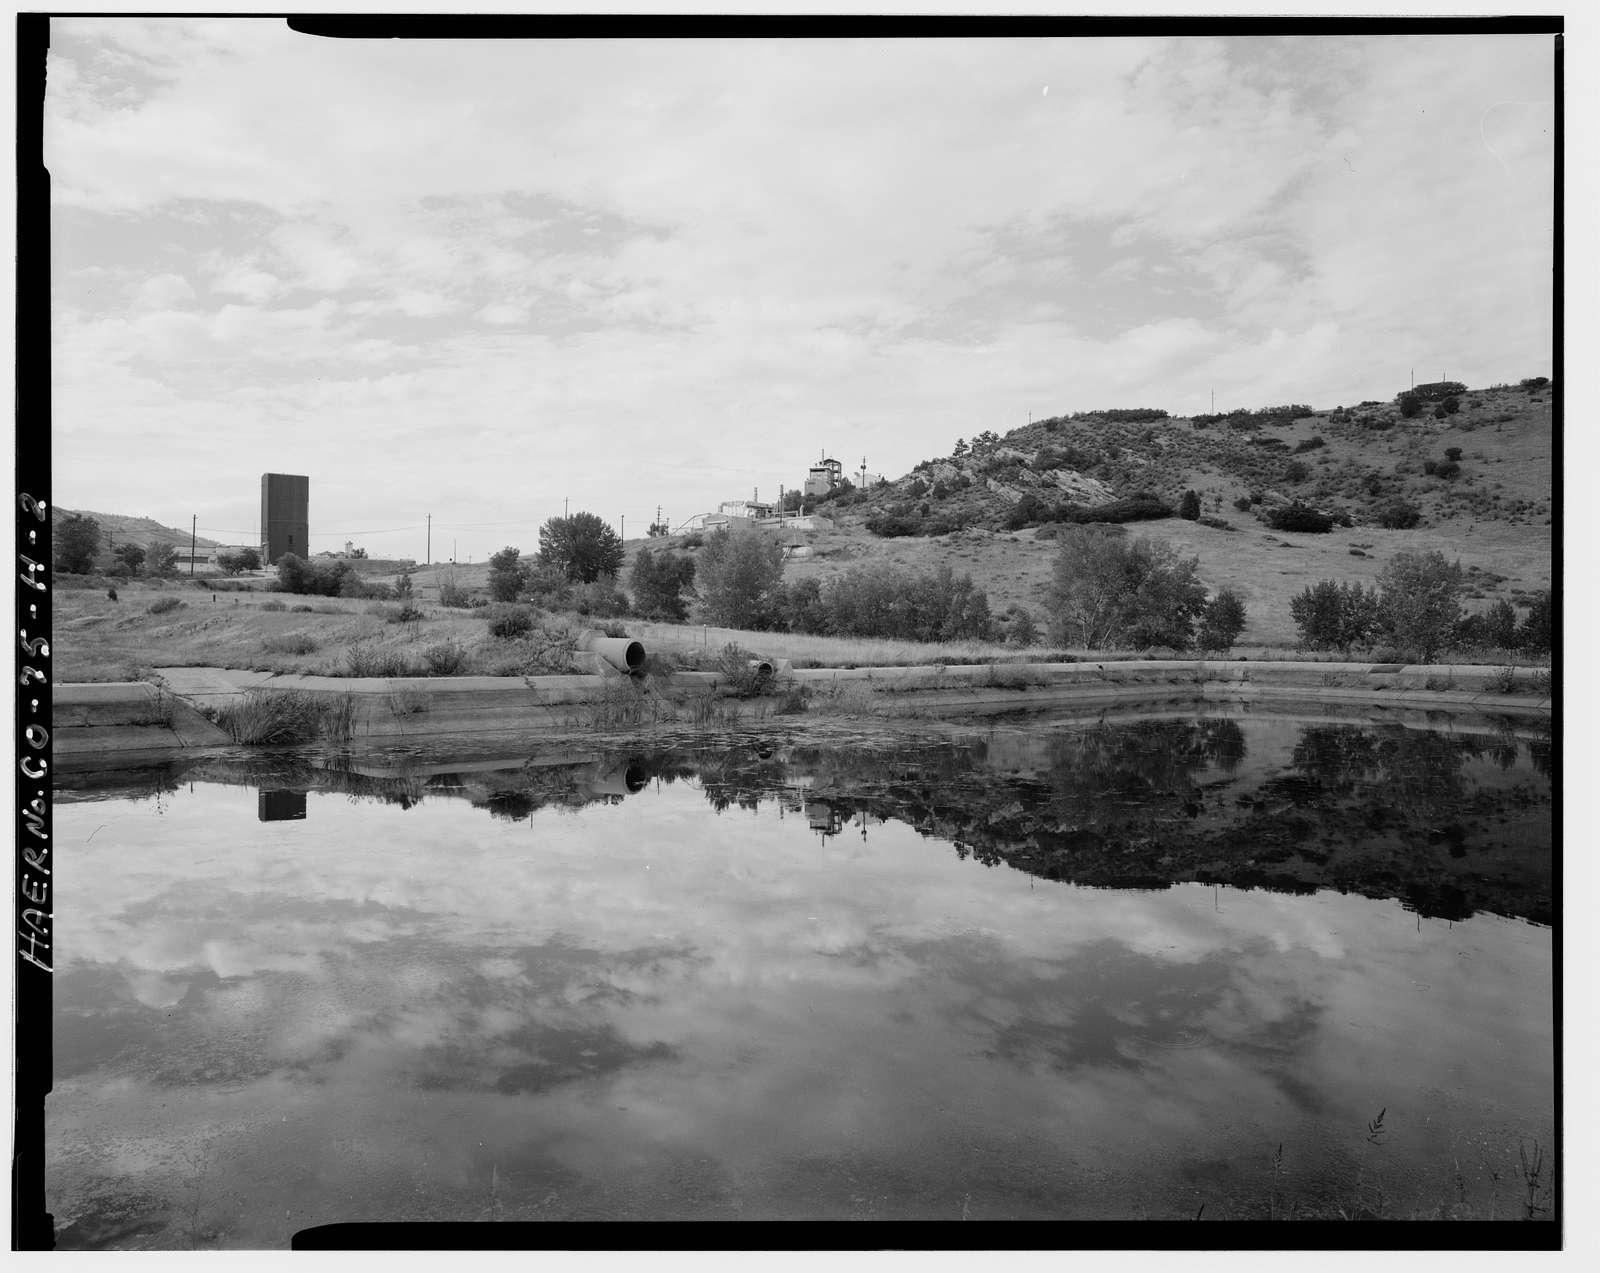 Glenn L. Martin Company, Titan Missile Test Facilities, Catch Basin, Waterton Canyon Road & Colorado Highway 121, Lakewood, Jefferson County, CO